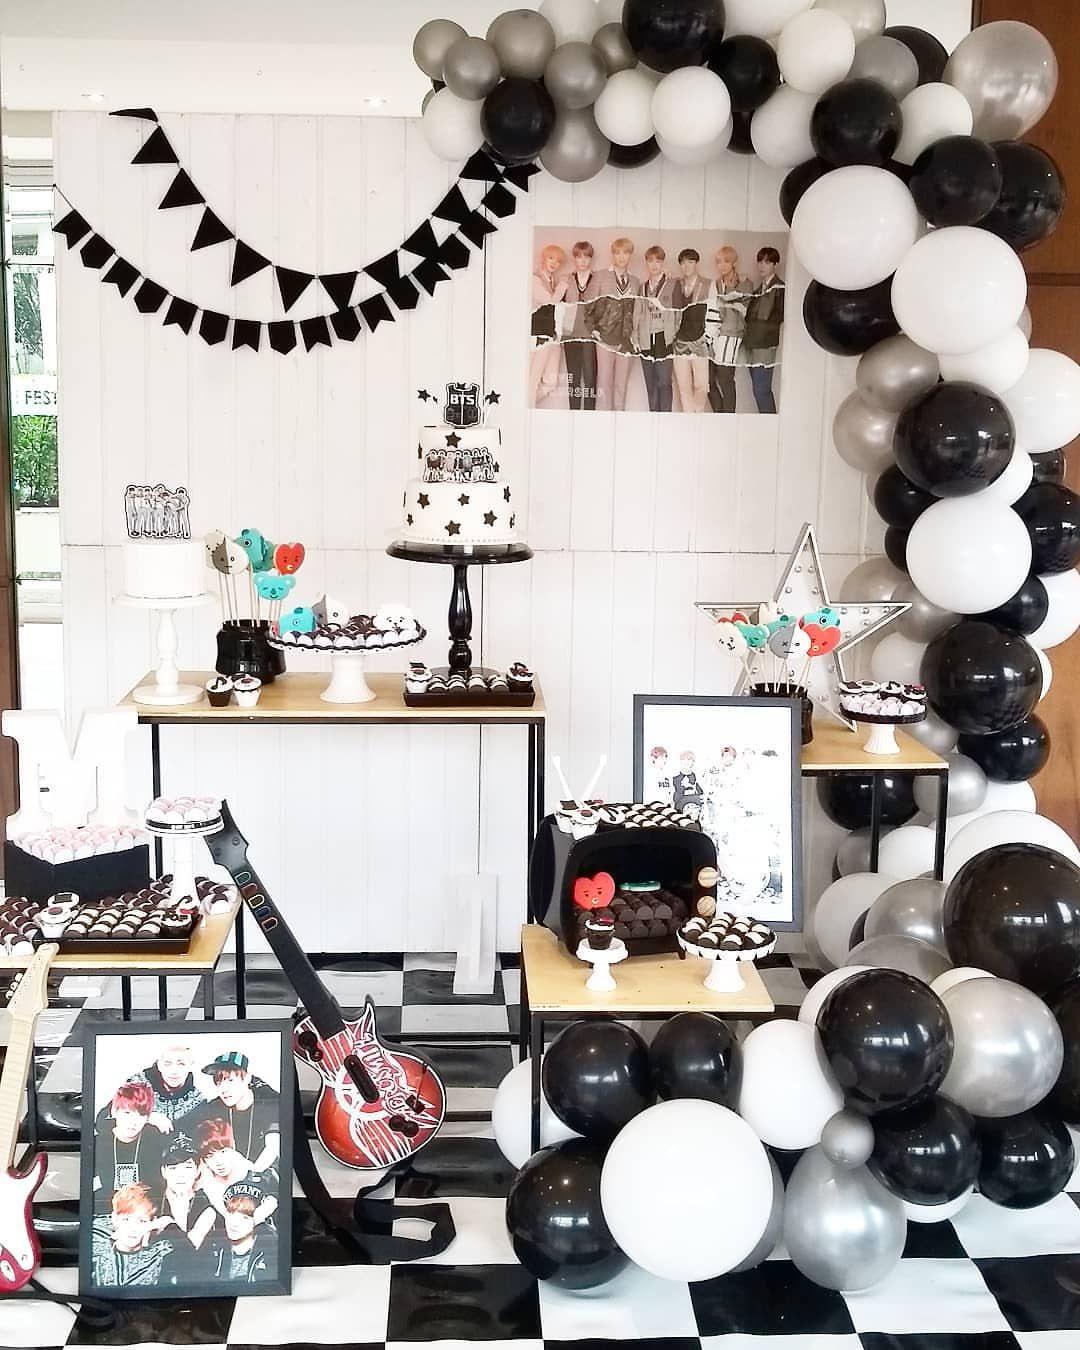 Fiestas de cumpleaños de bts